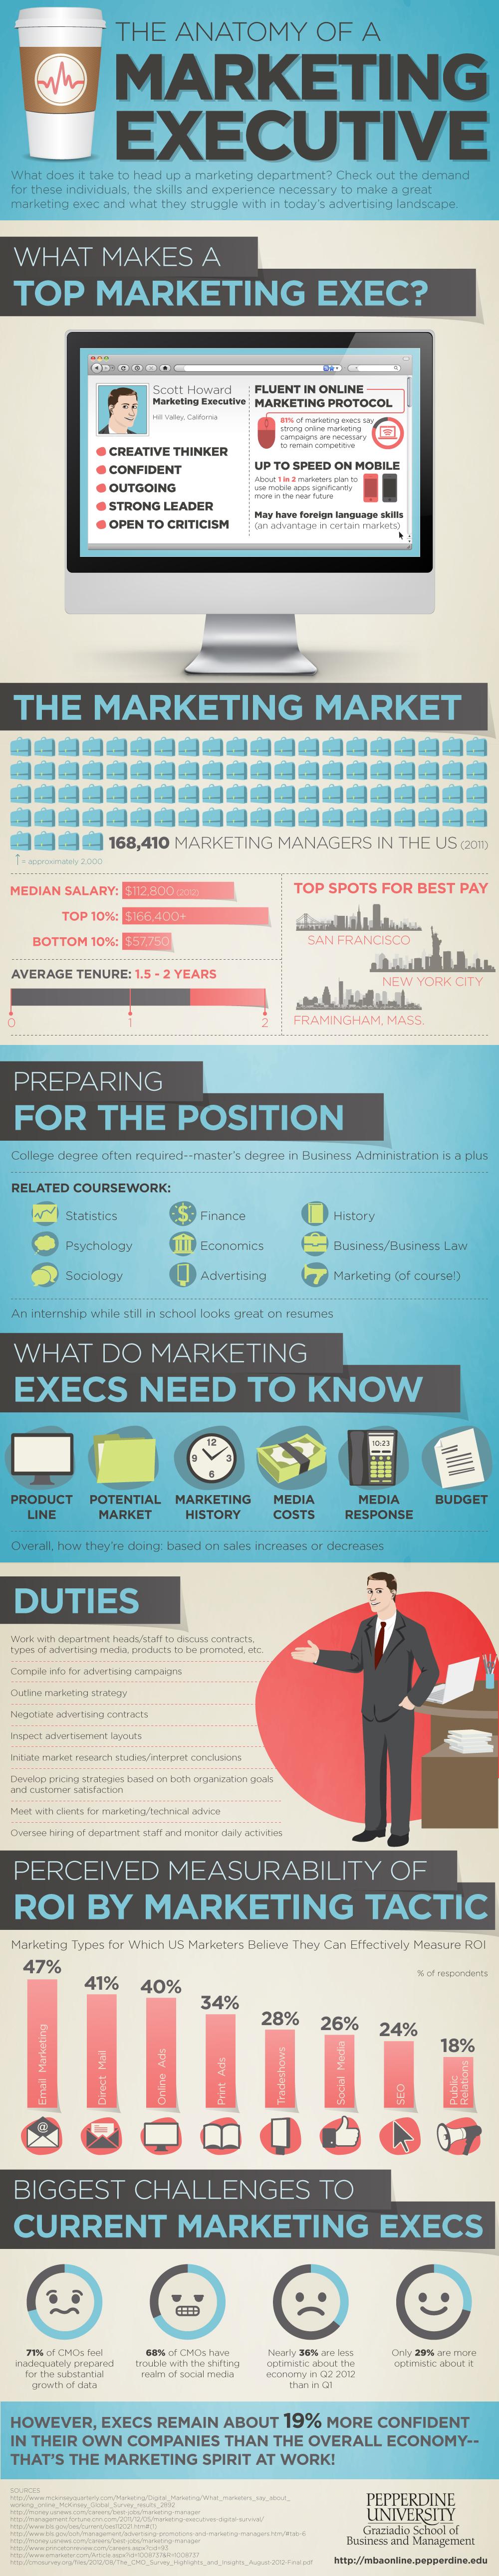 anatomy-of-a-marketing-executive_50b57e6736c4a